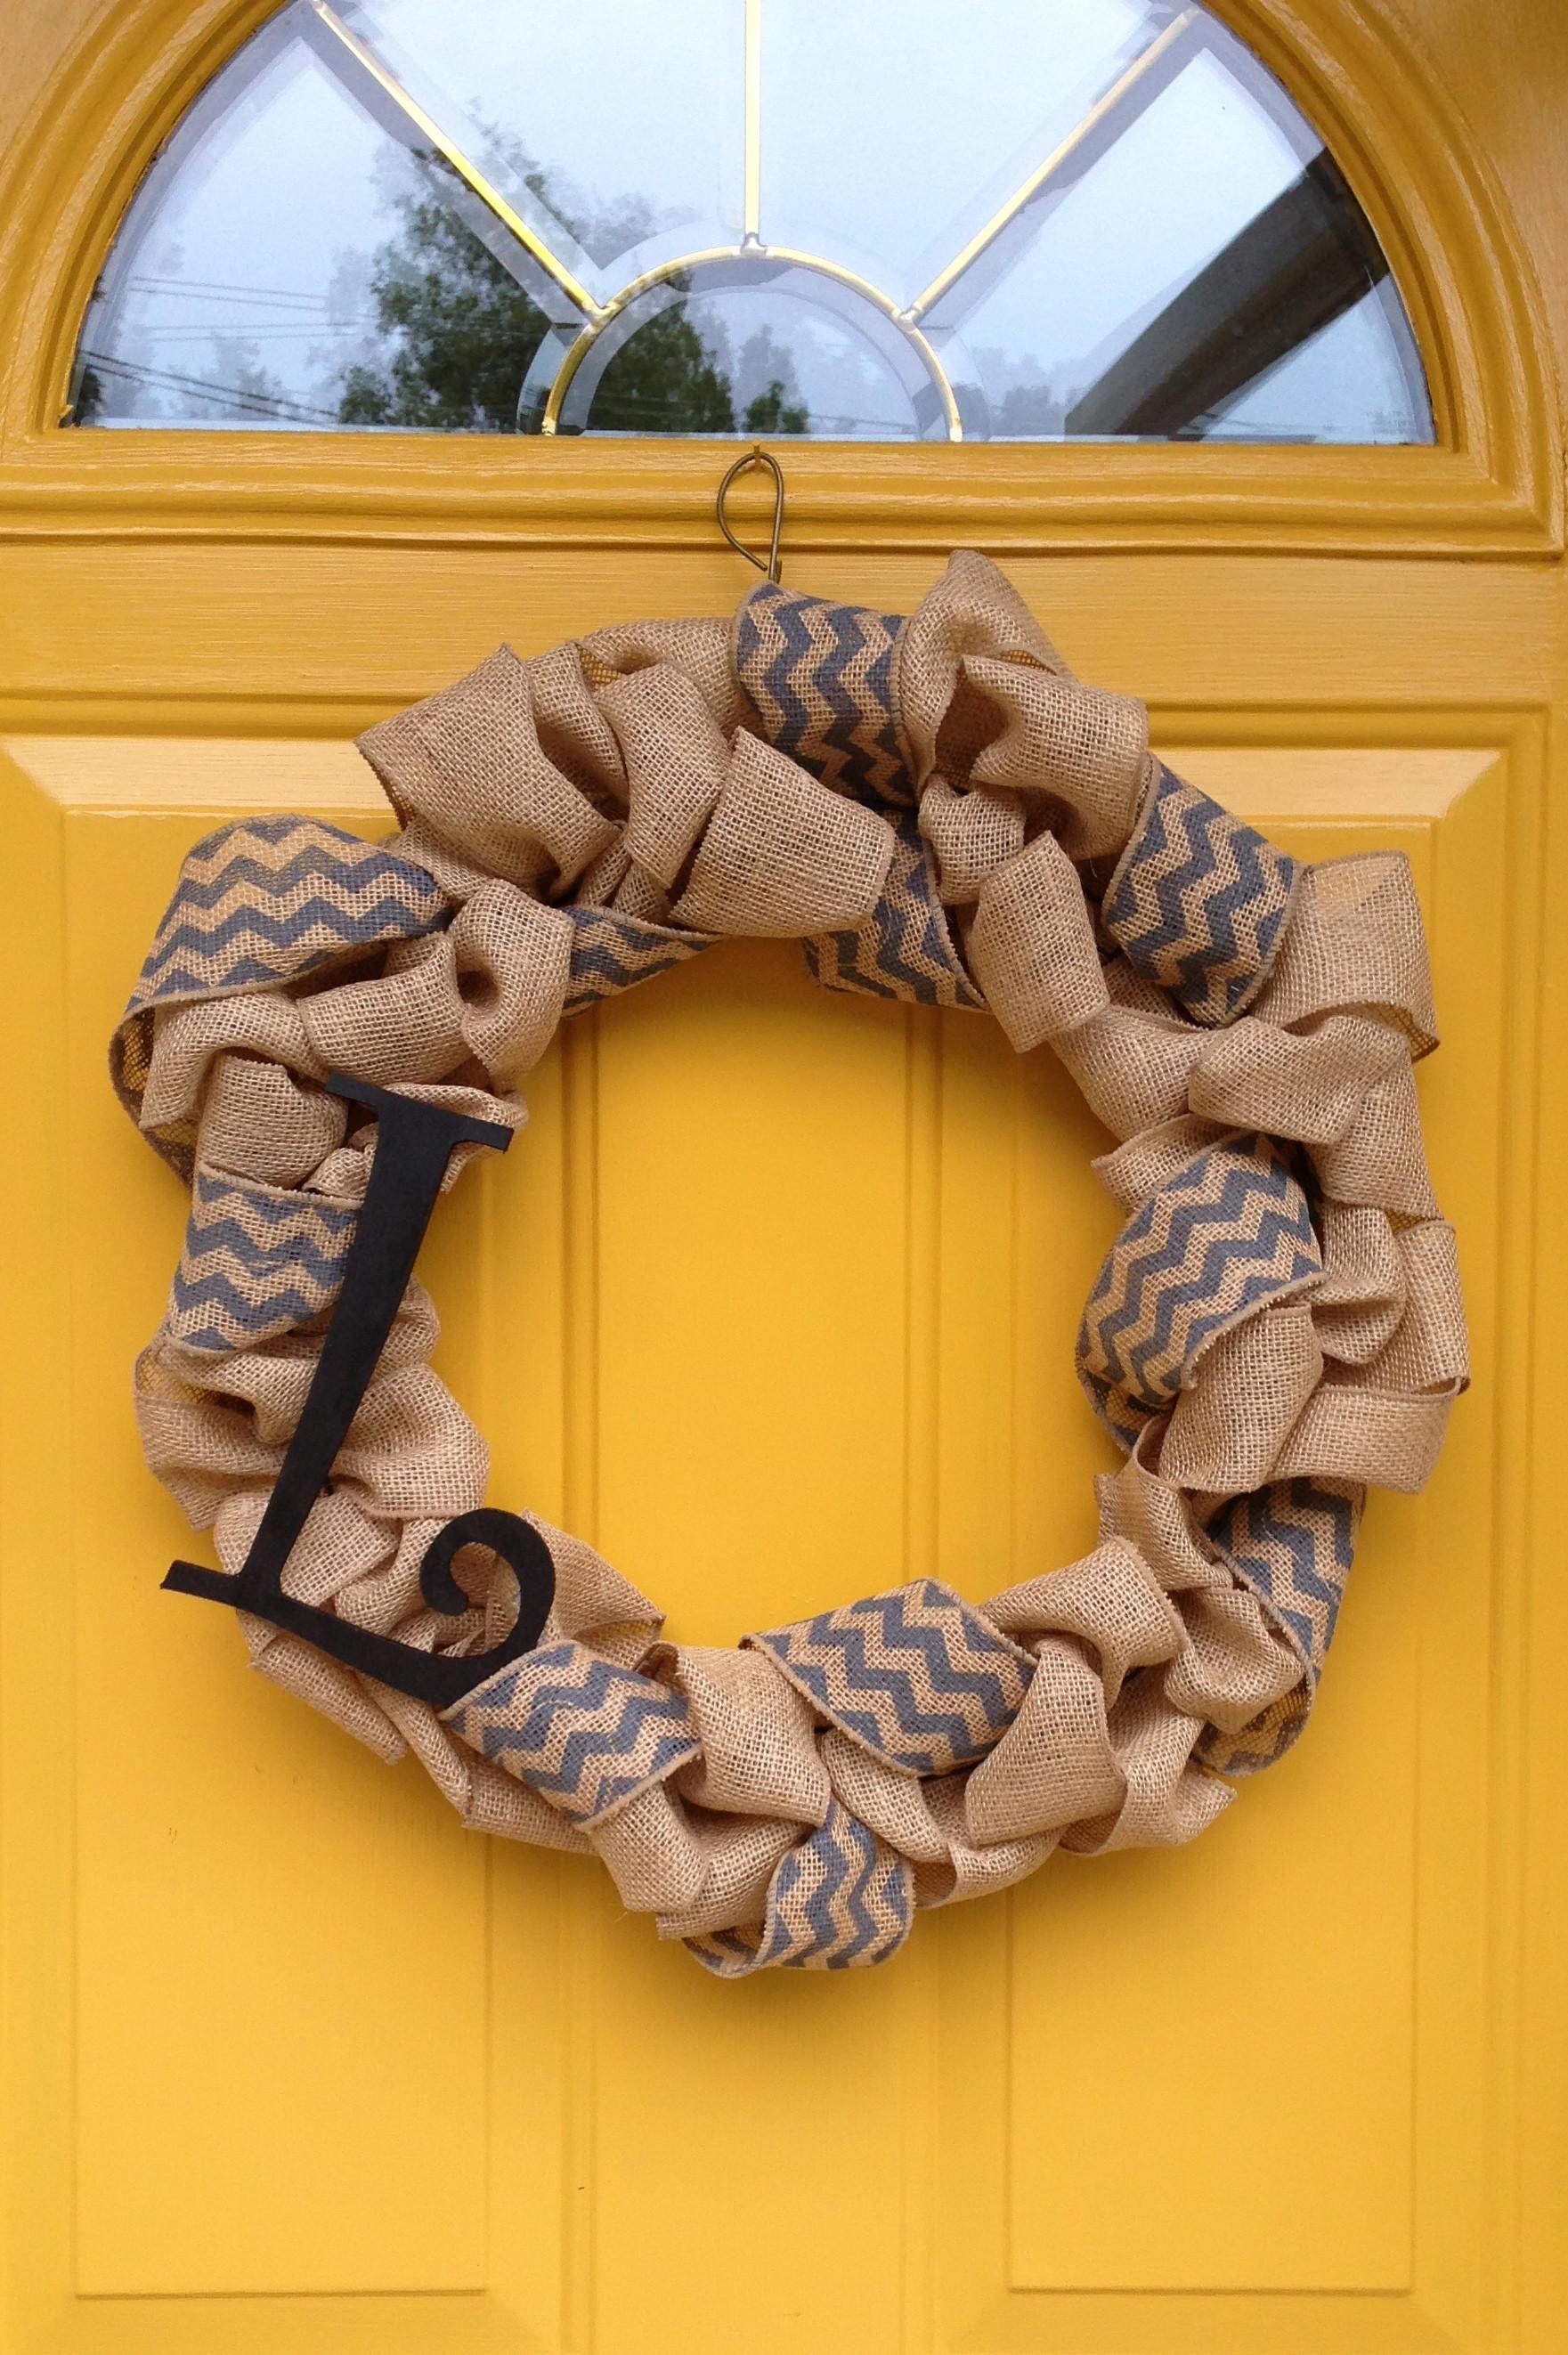 Best ideas about Burlap Wreath DIY . Save or Pin DIY Burlap Monogrammed Wreath Now.